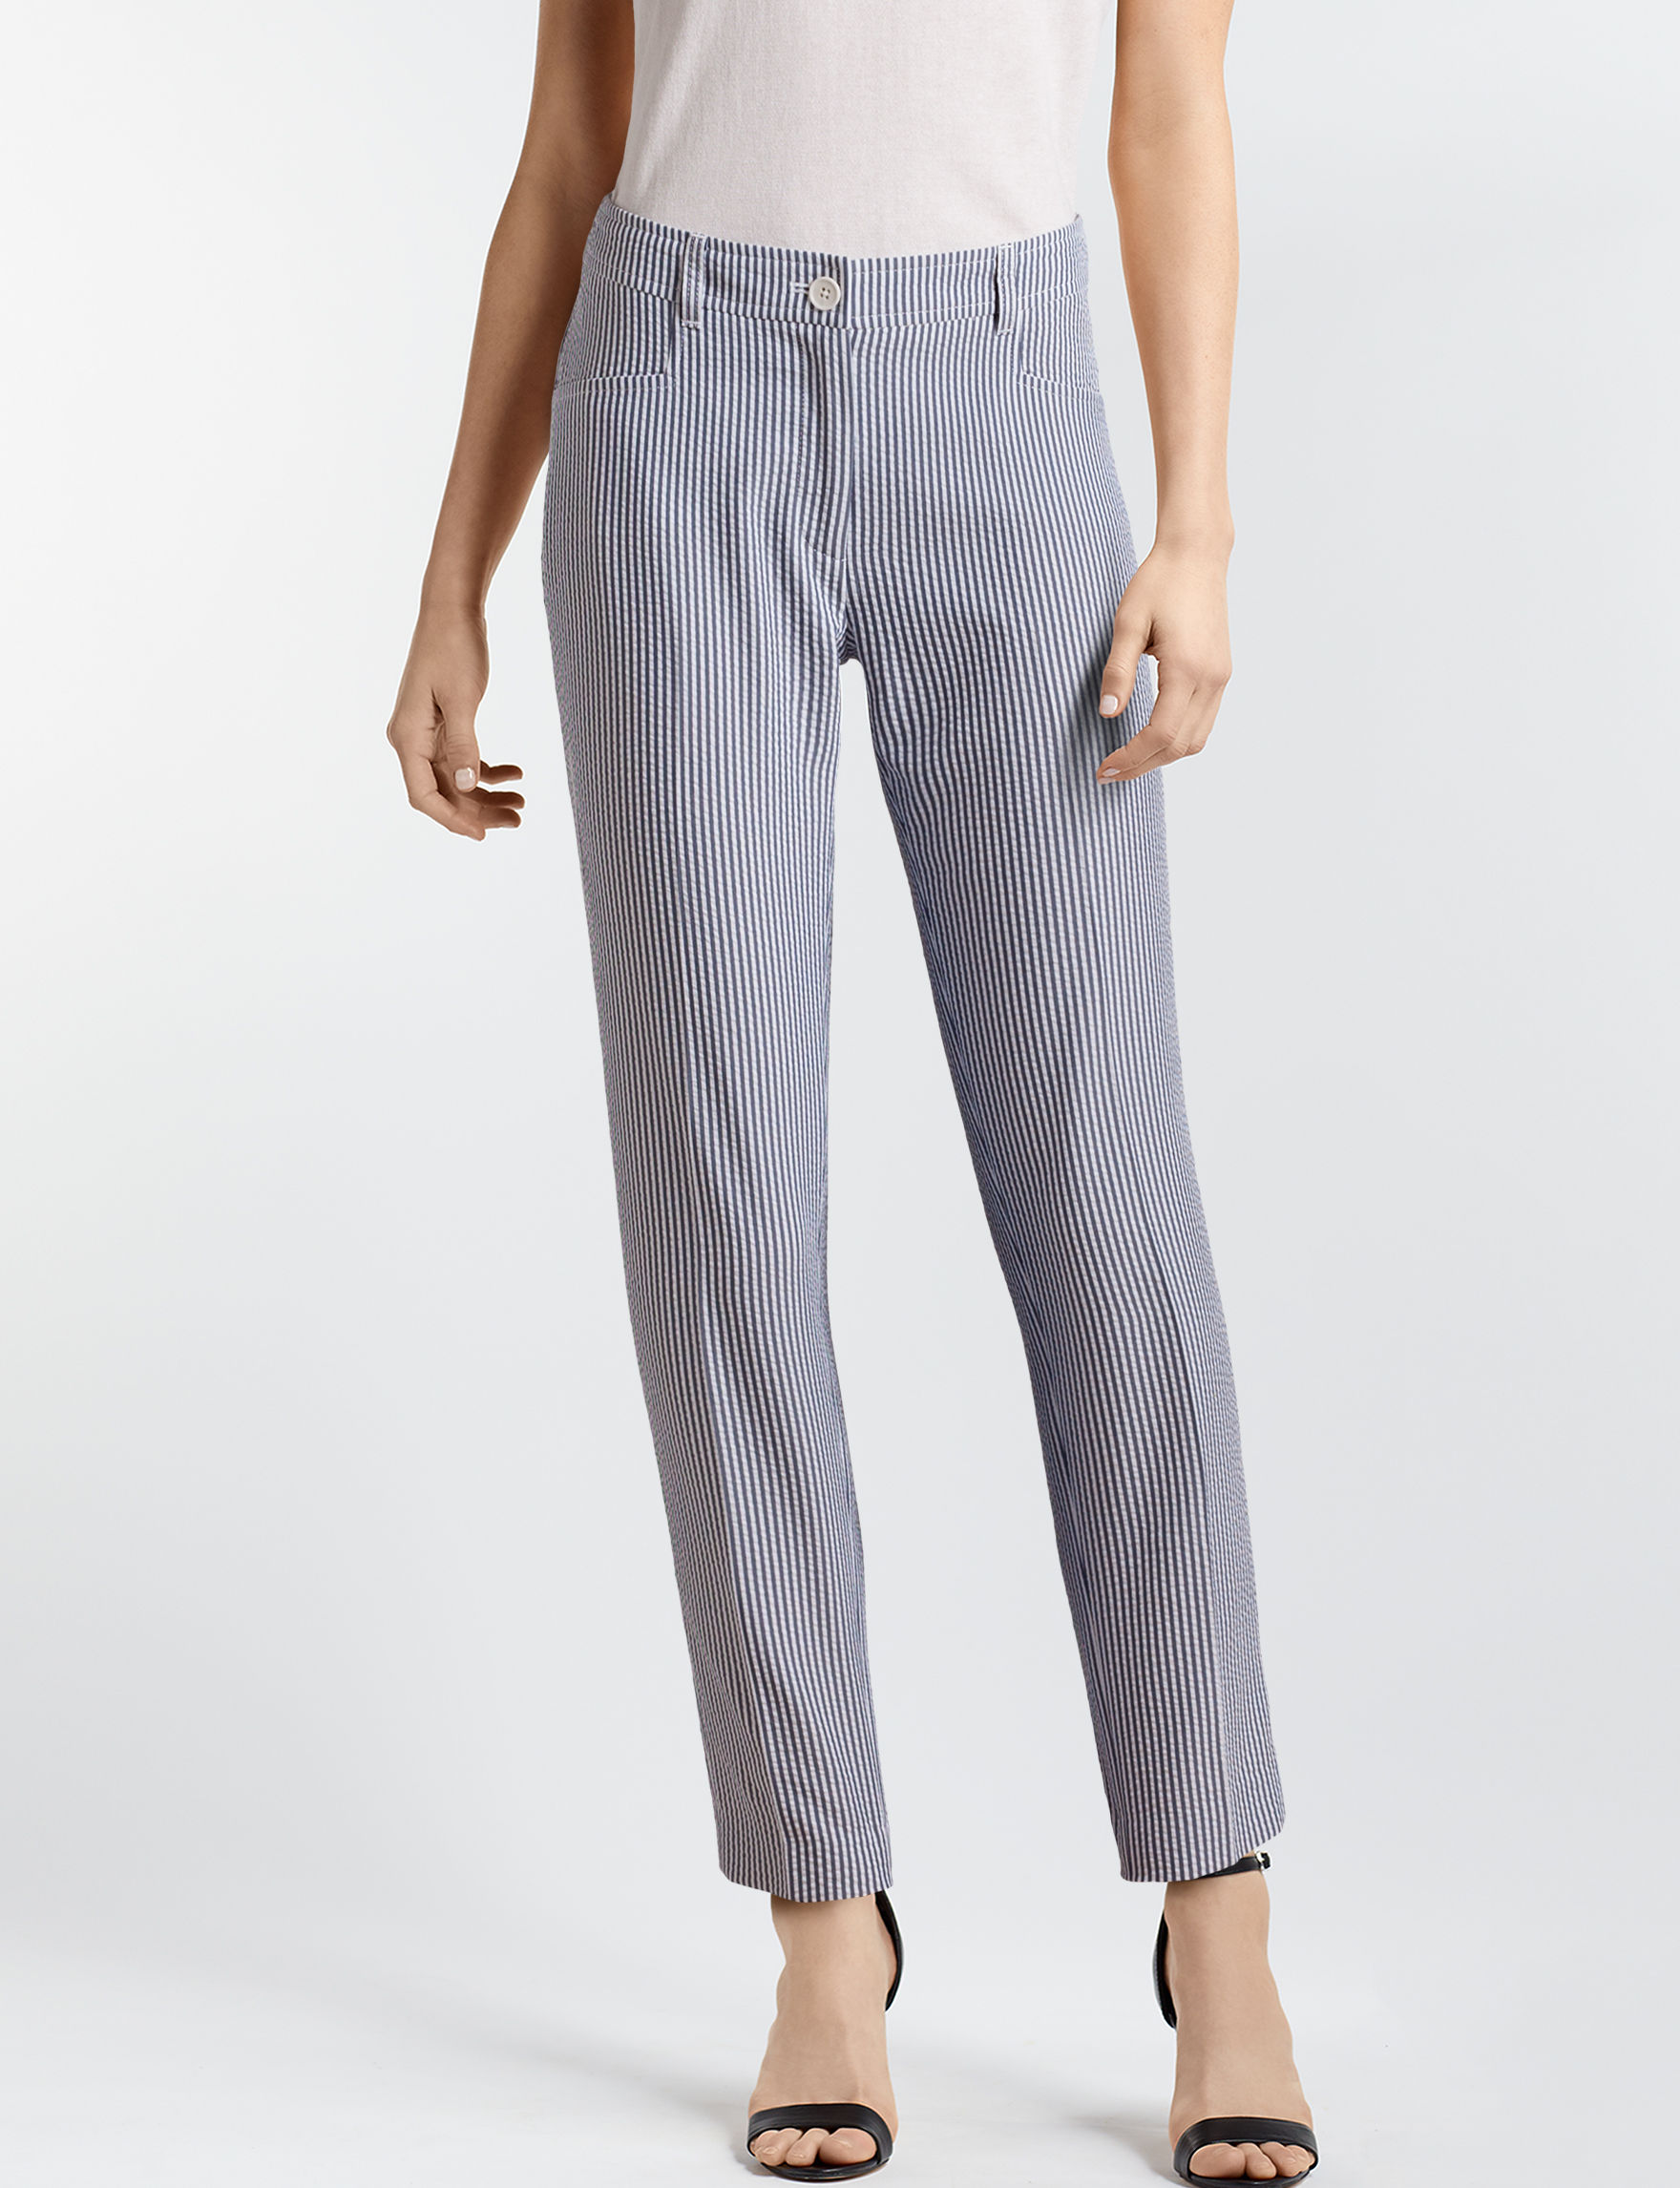 Anne Klein White / Navy Soft Pants